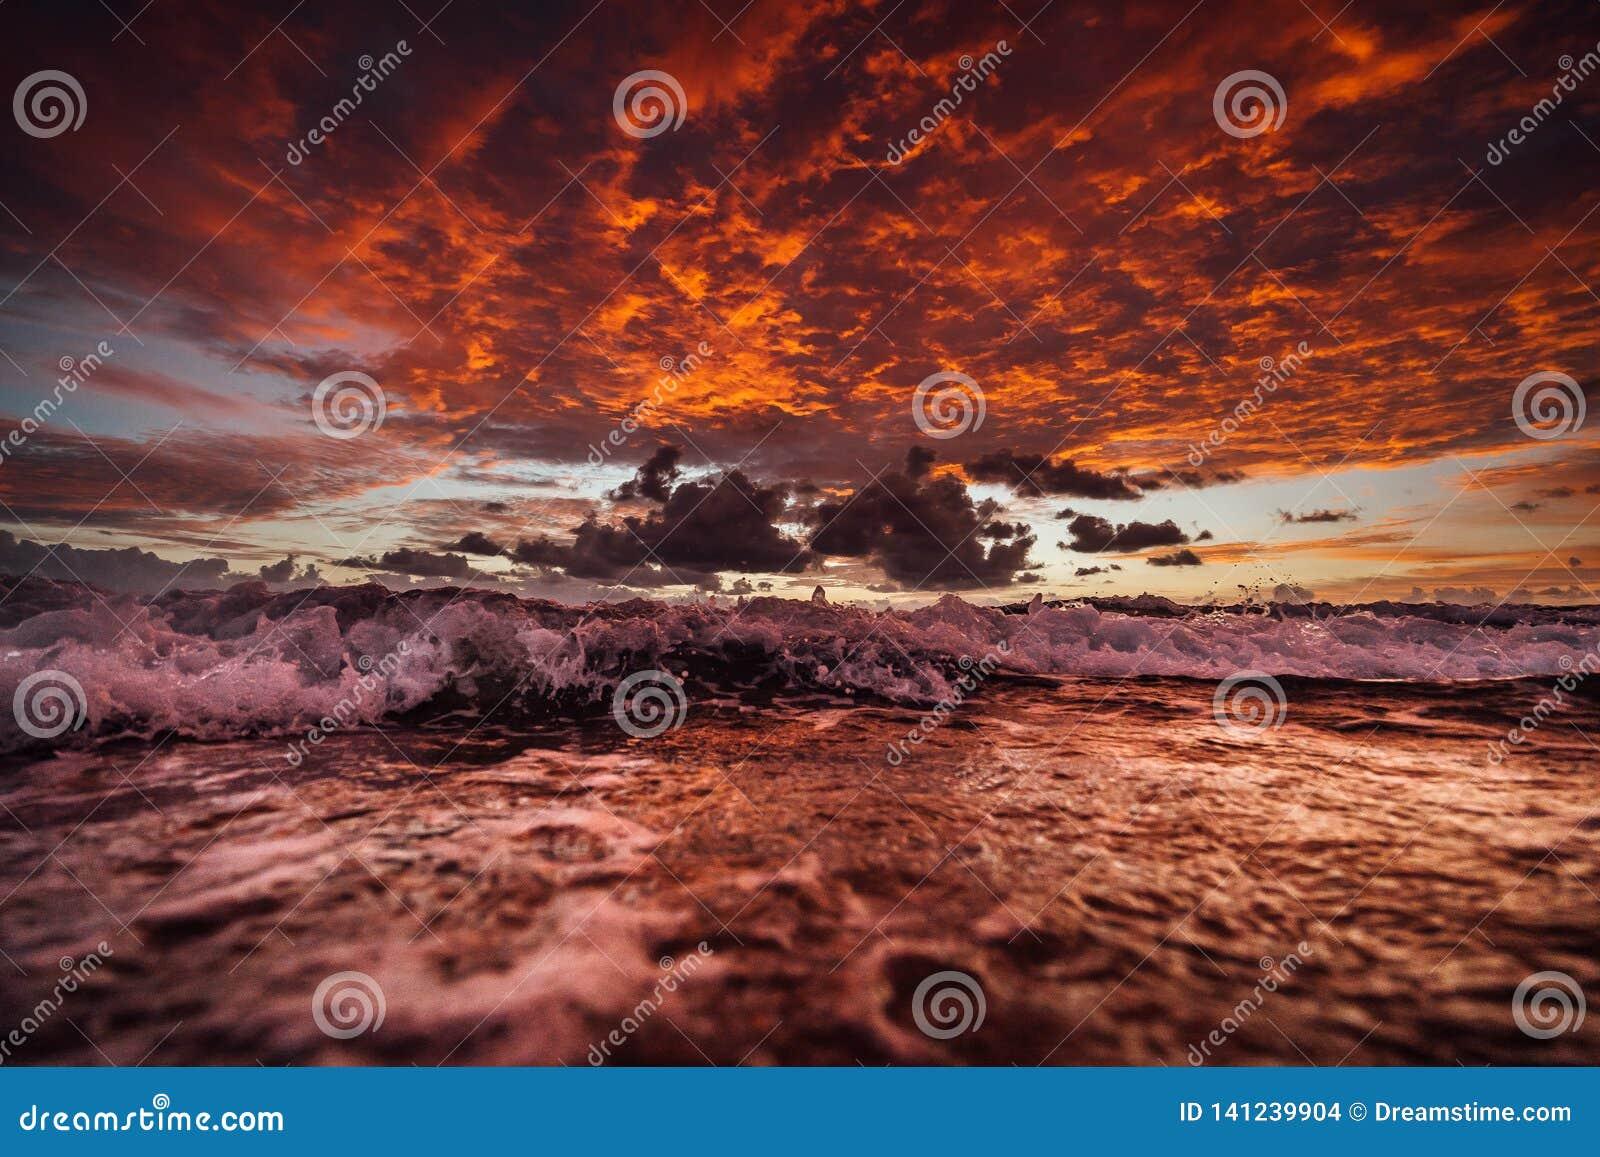 Zonsopgang op frasereiland met golven